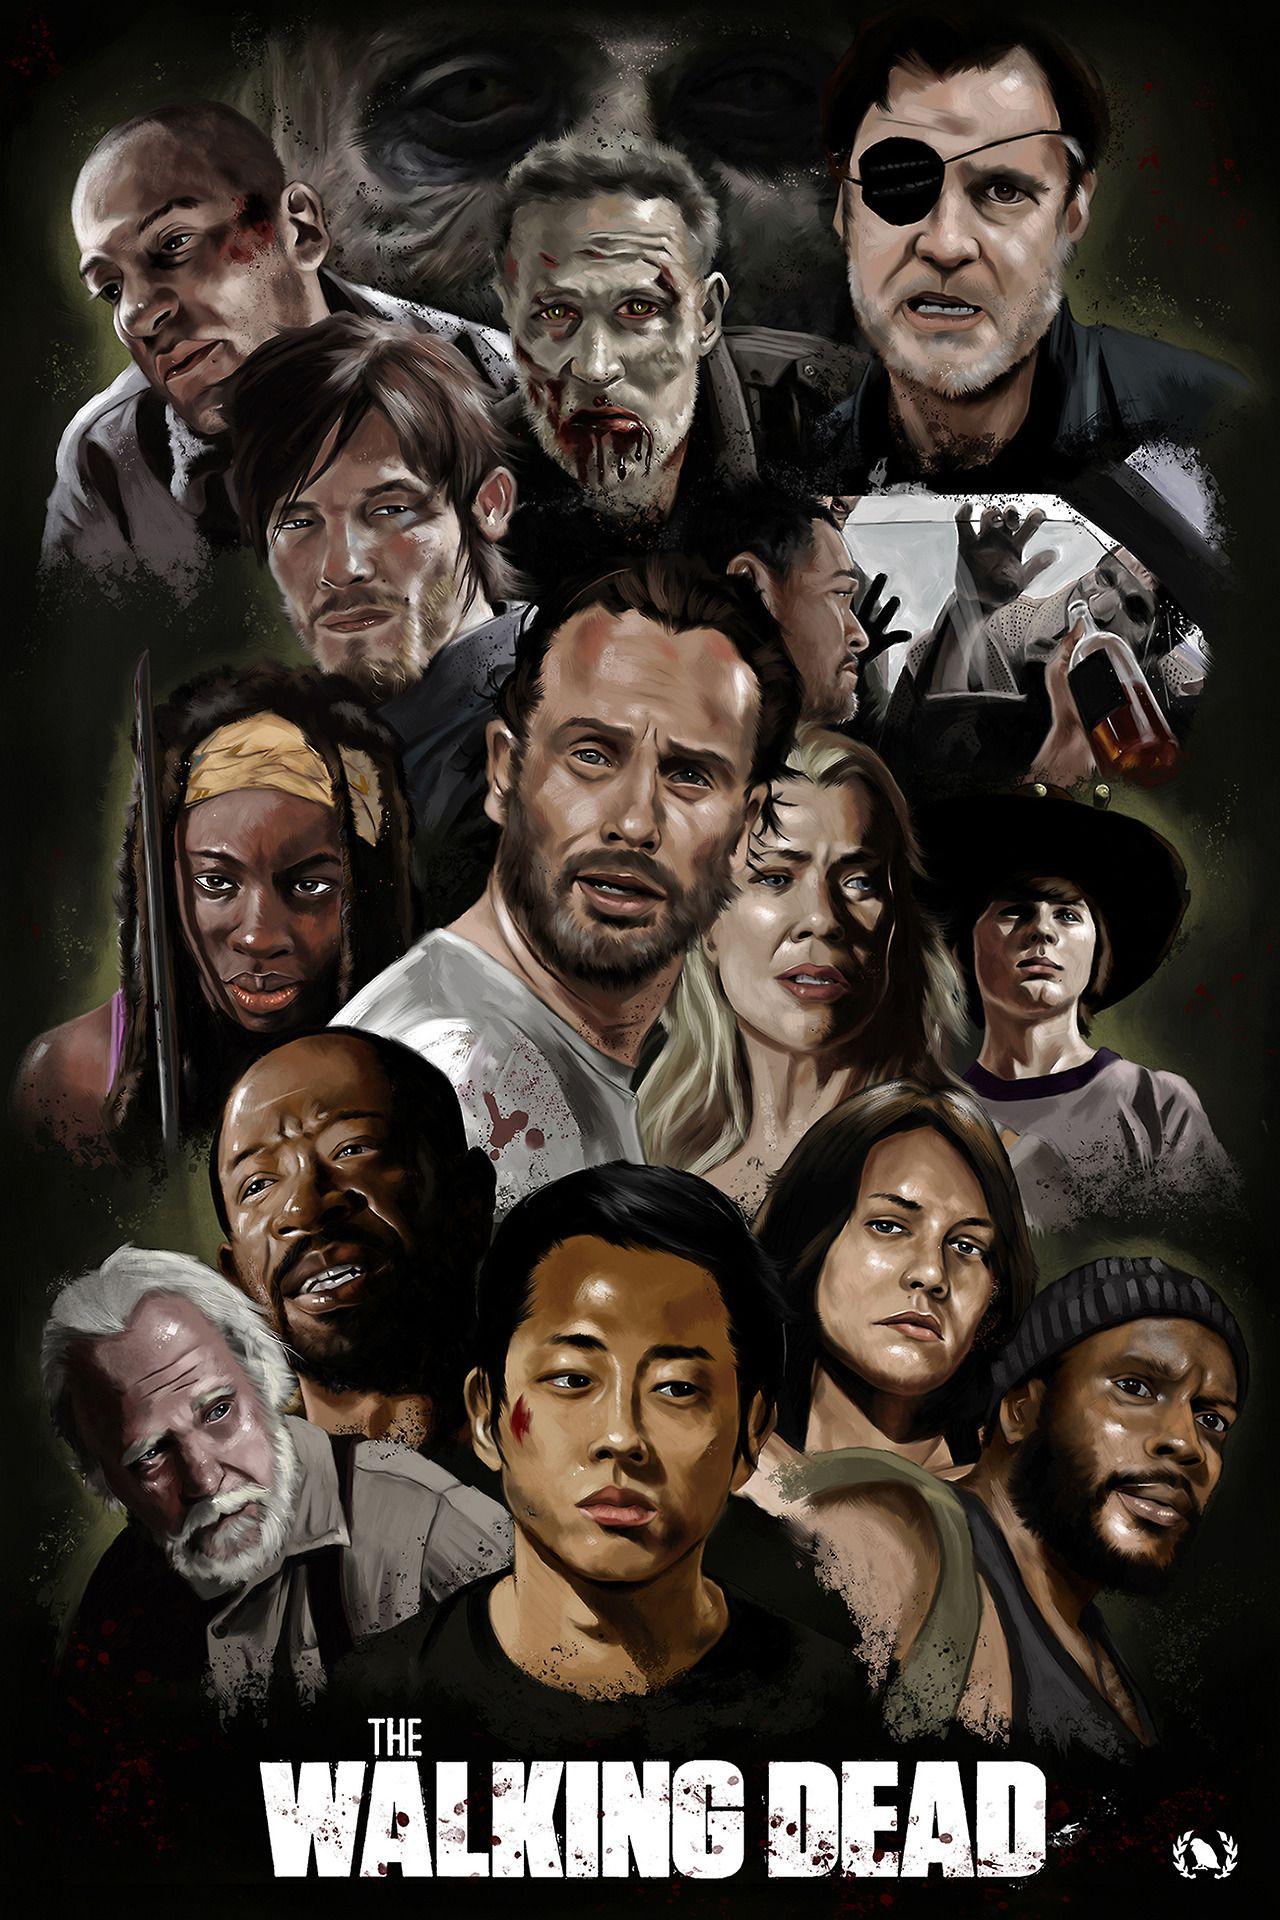 Pin by BROTHERTEDD on The Walking Dead | Walking dead fan art, Walking dead  art, Walking dead show